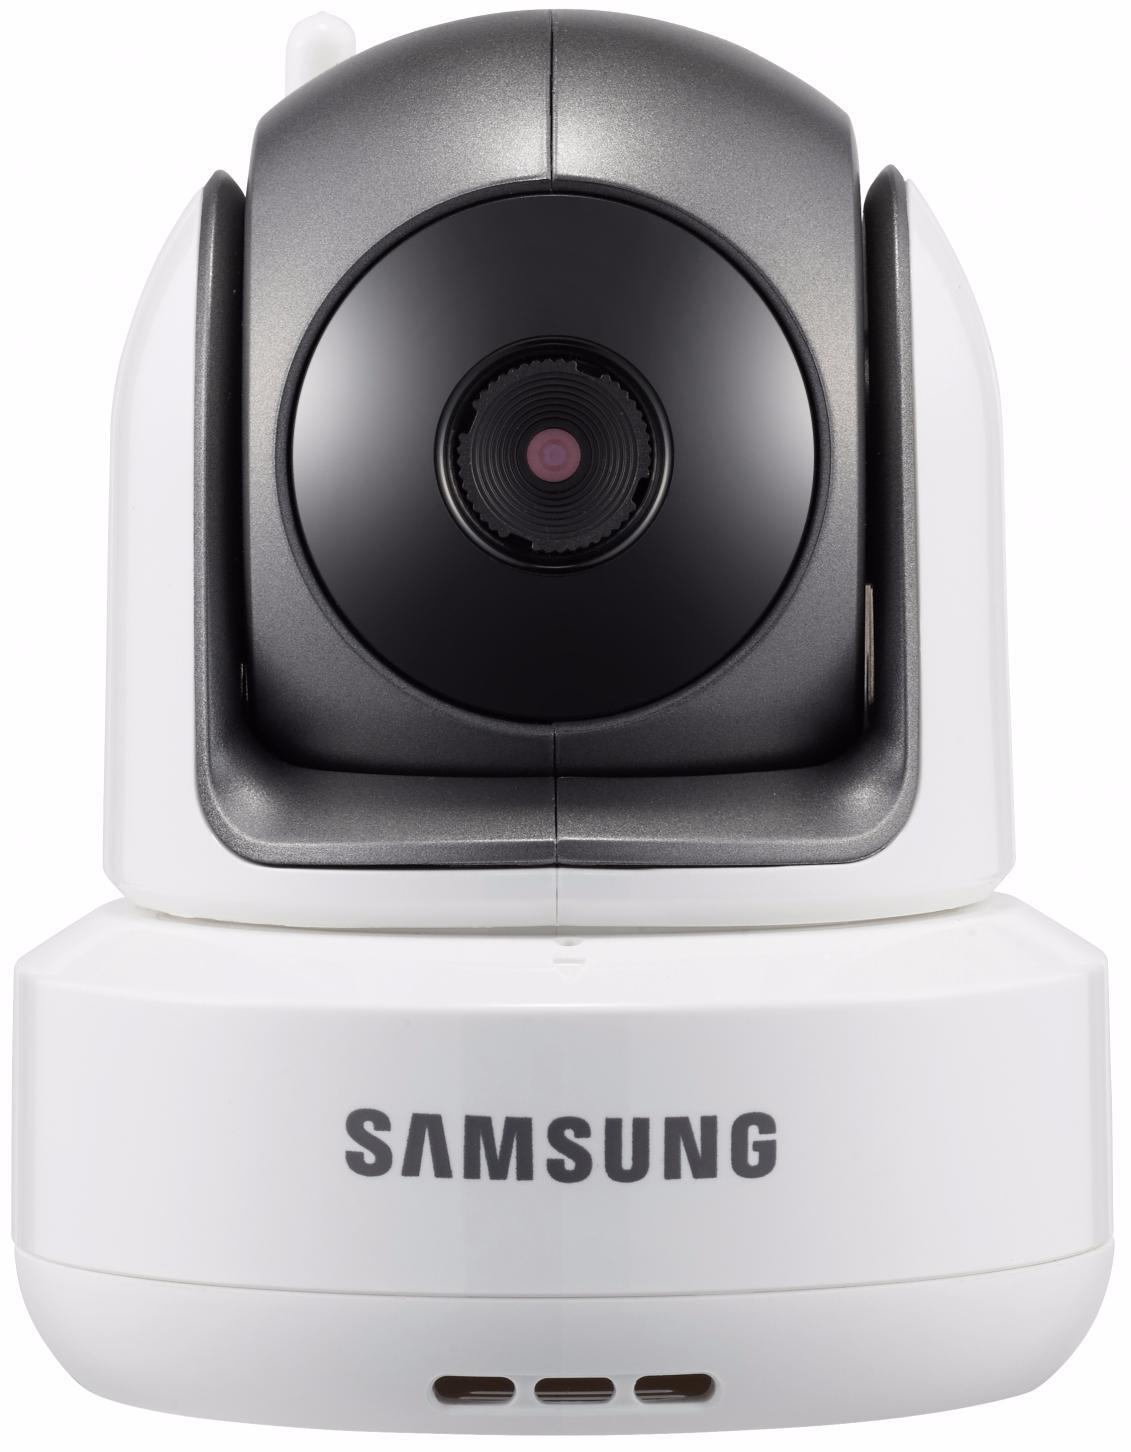 Samsung SEB-1003RWP - дополнительная камера для видеоняни Samsung SEW-3043WP (White)